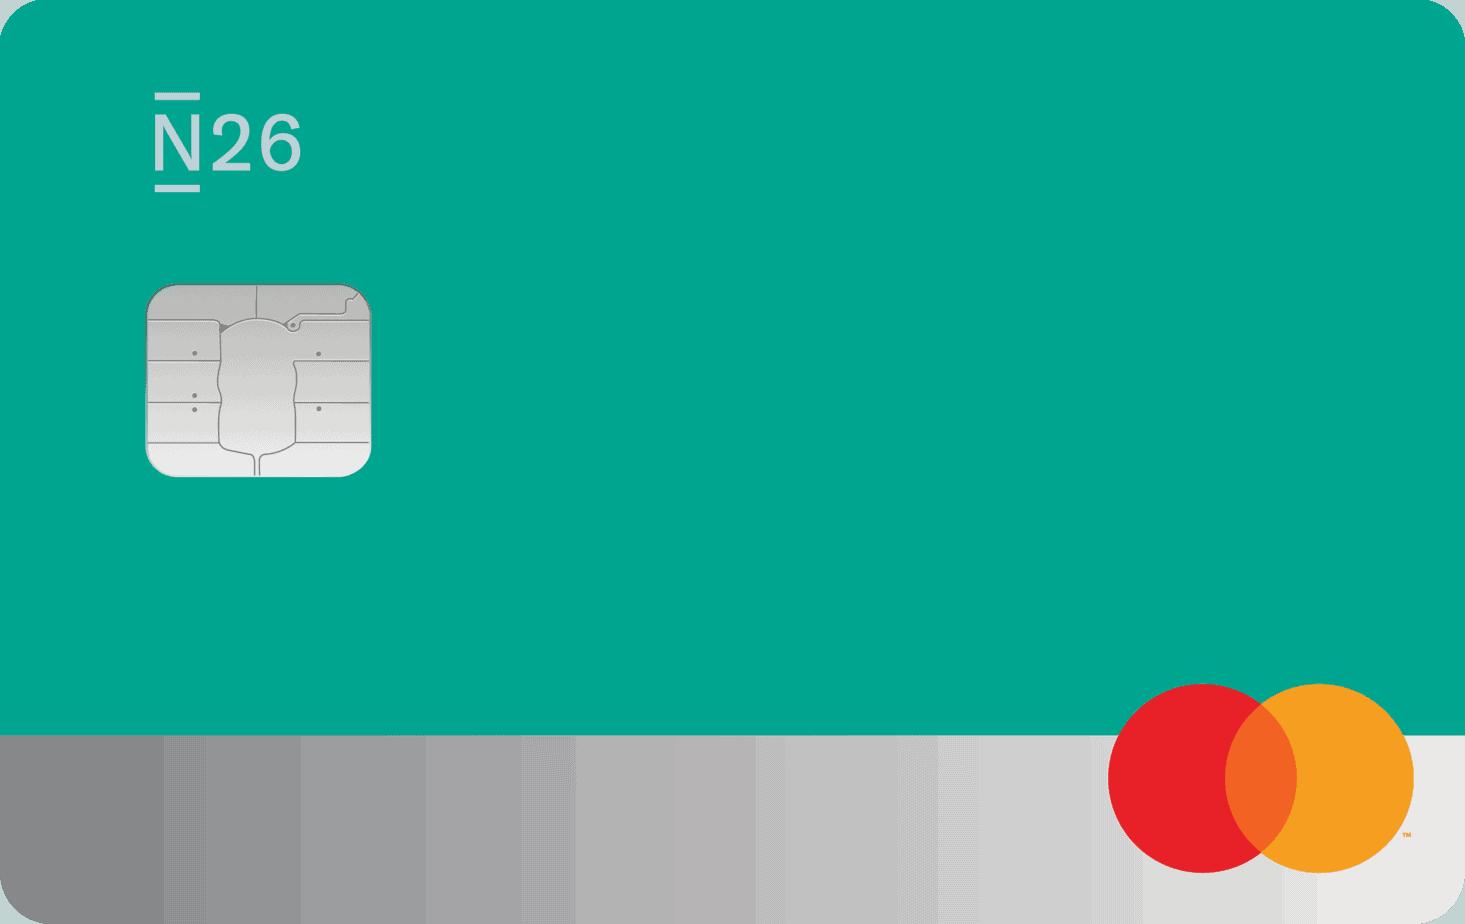 carta n26 Smart migliore carta prepagata premium